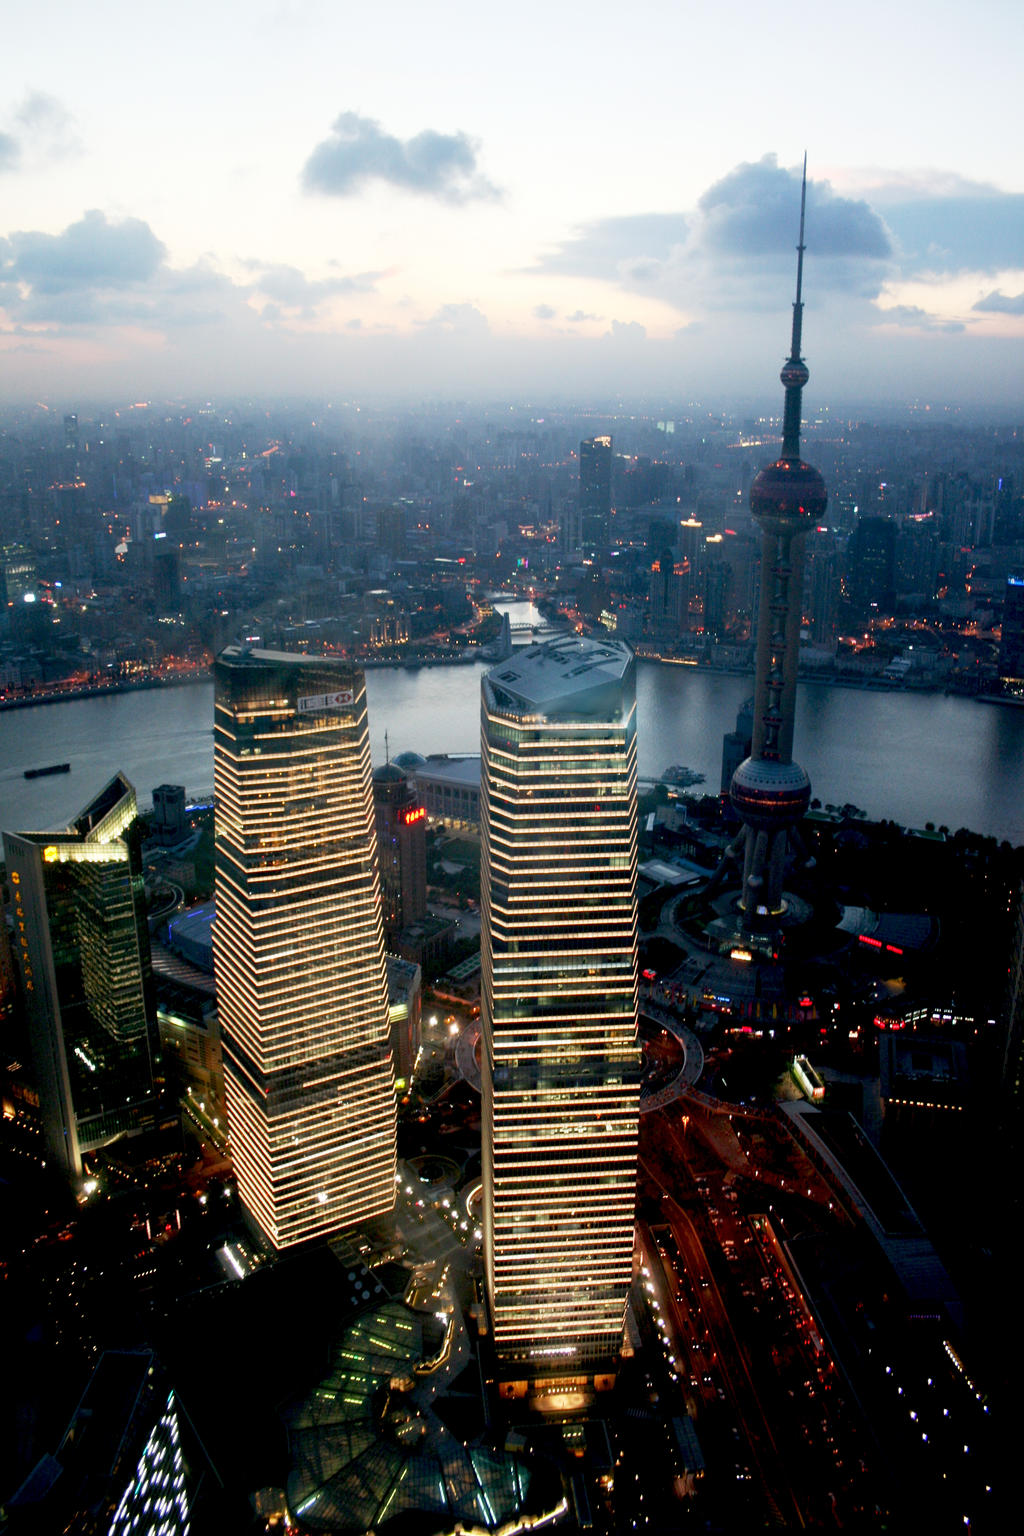 Shanghai Skyline by Janina-Photography